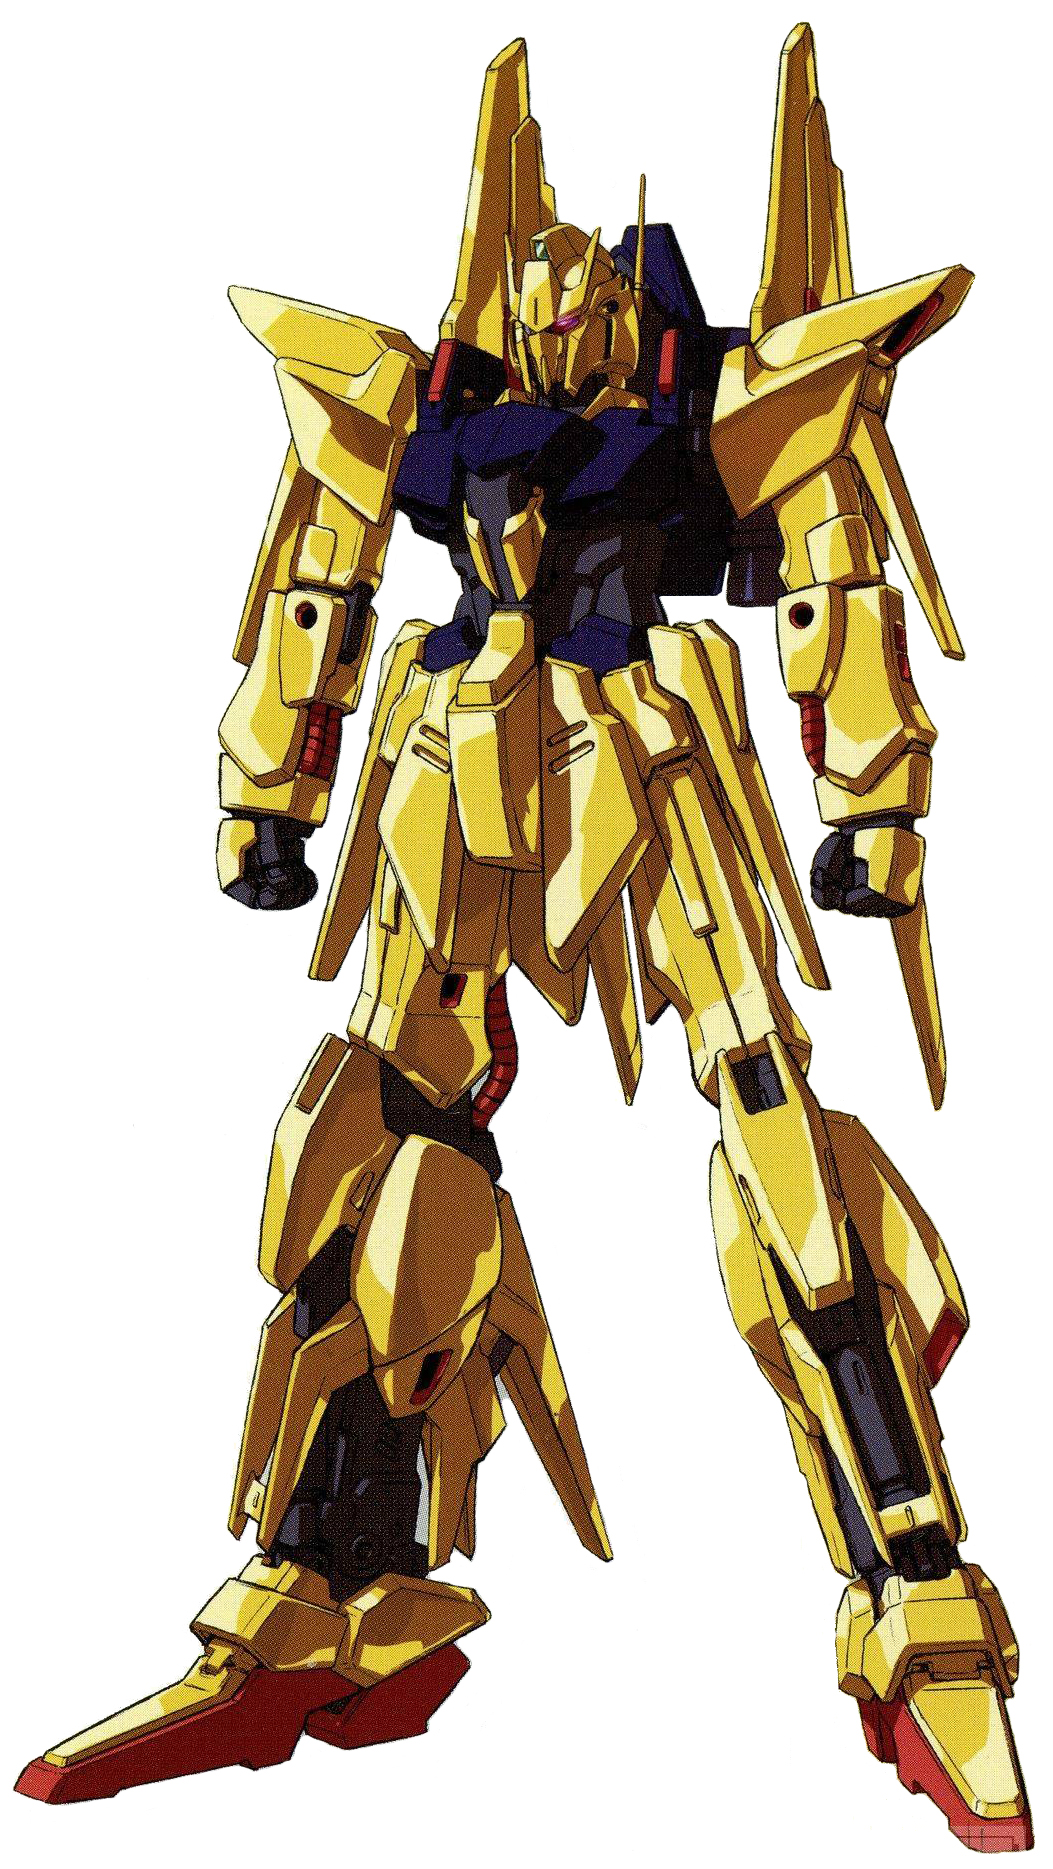 MSN-001 Delta Gundam - Gundam Wiki